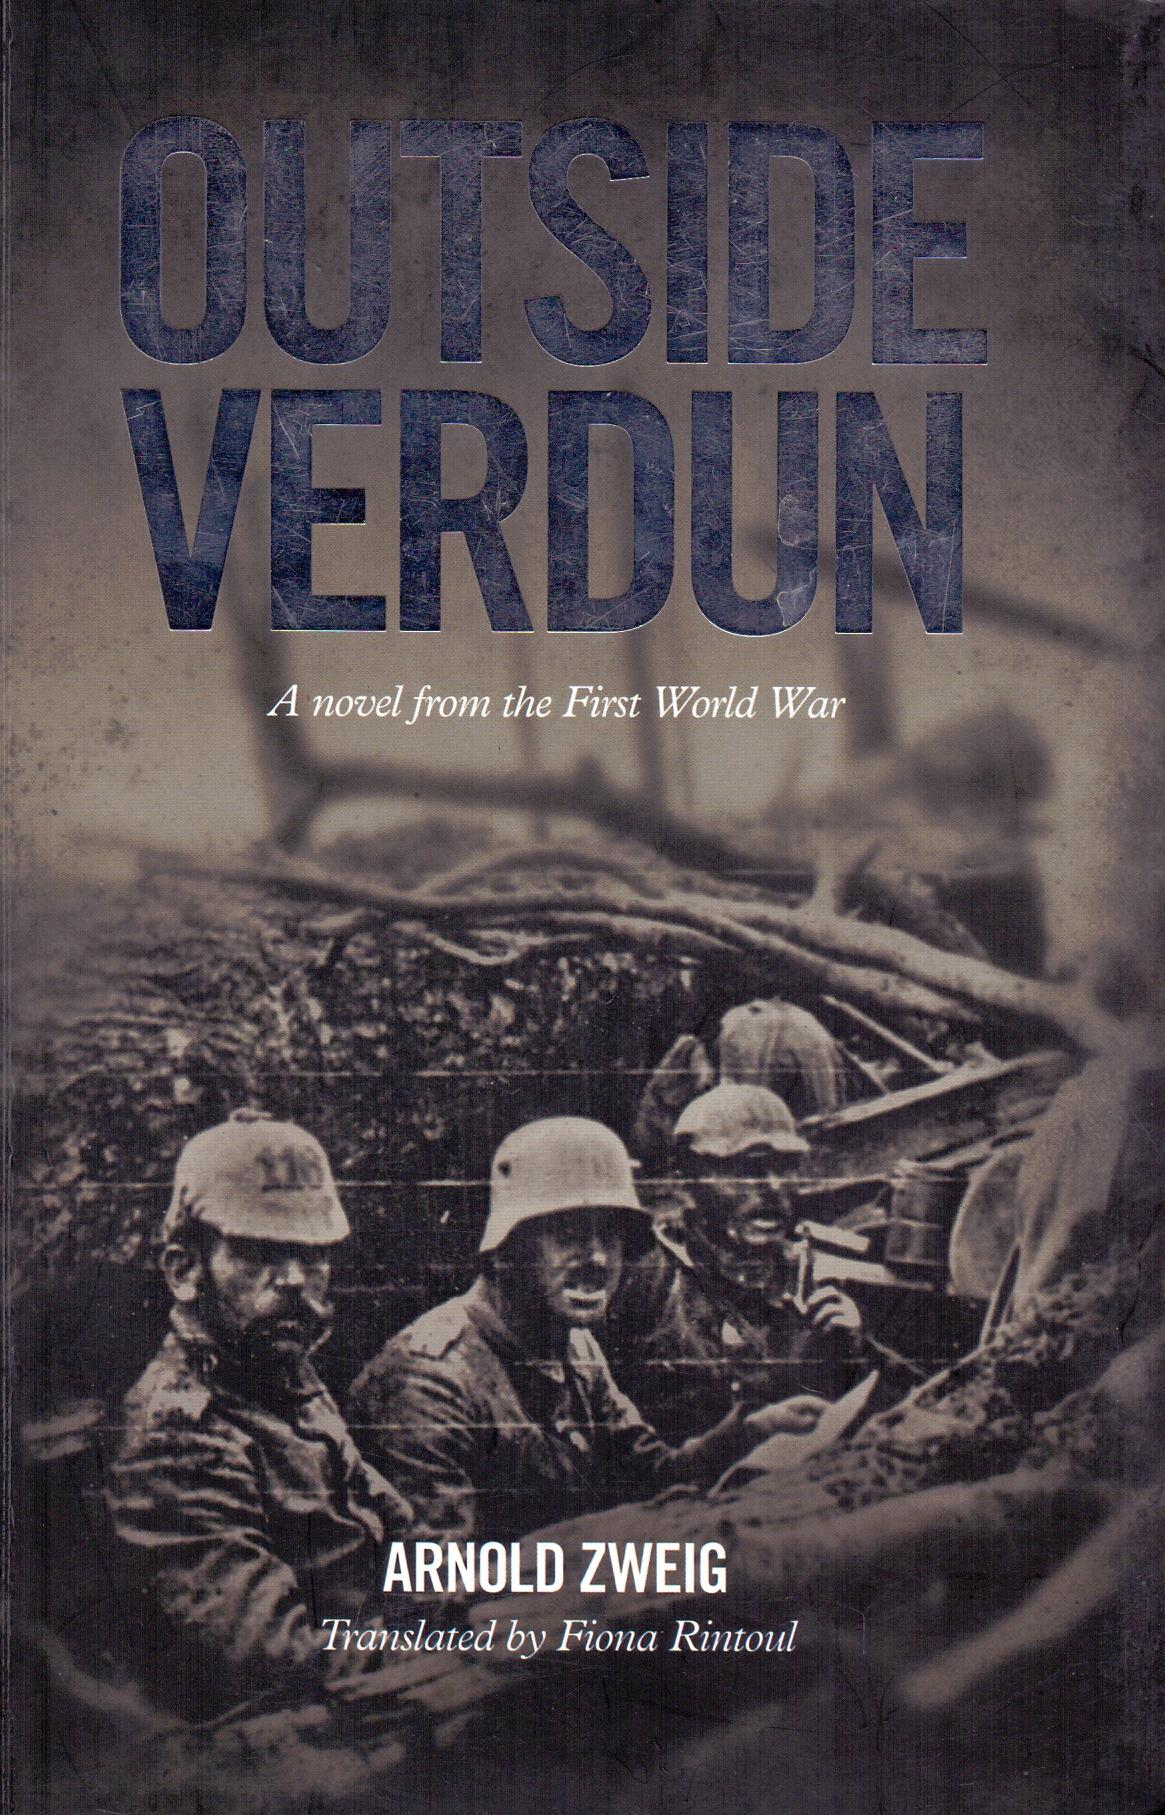 Outside Verdun - Arnold Zweig [Paperback]